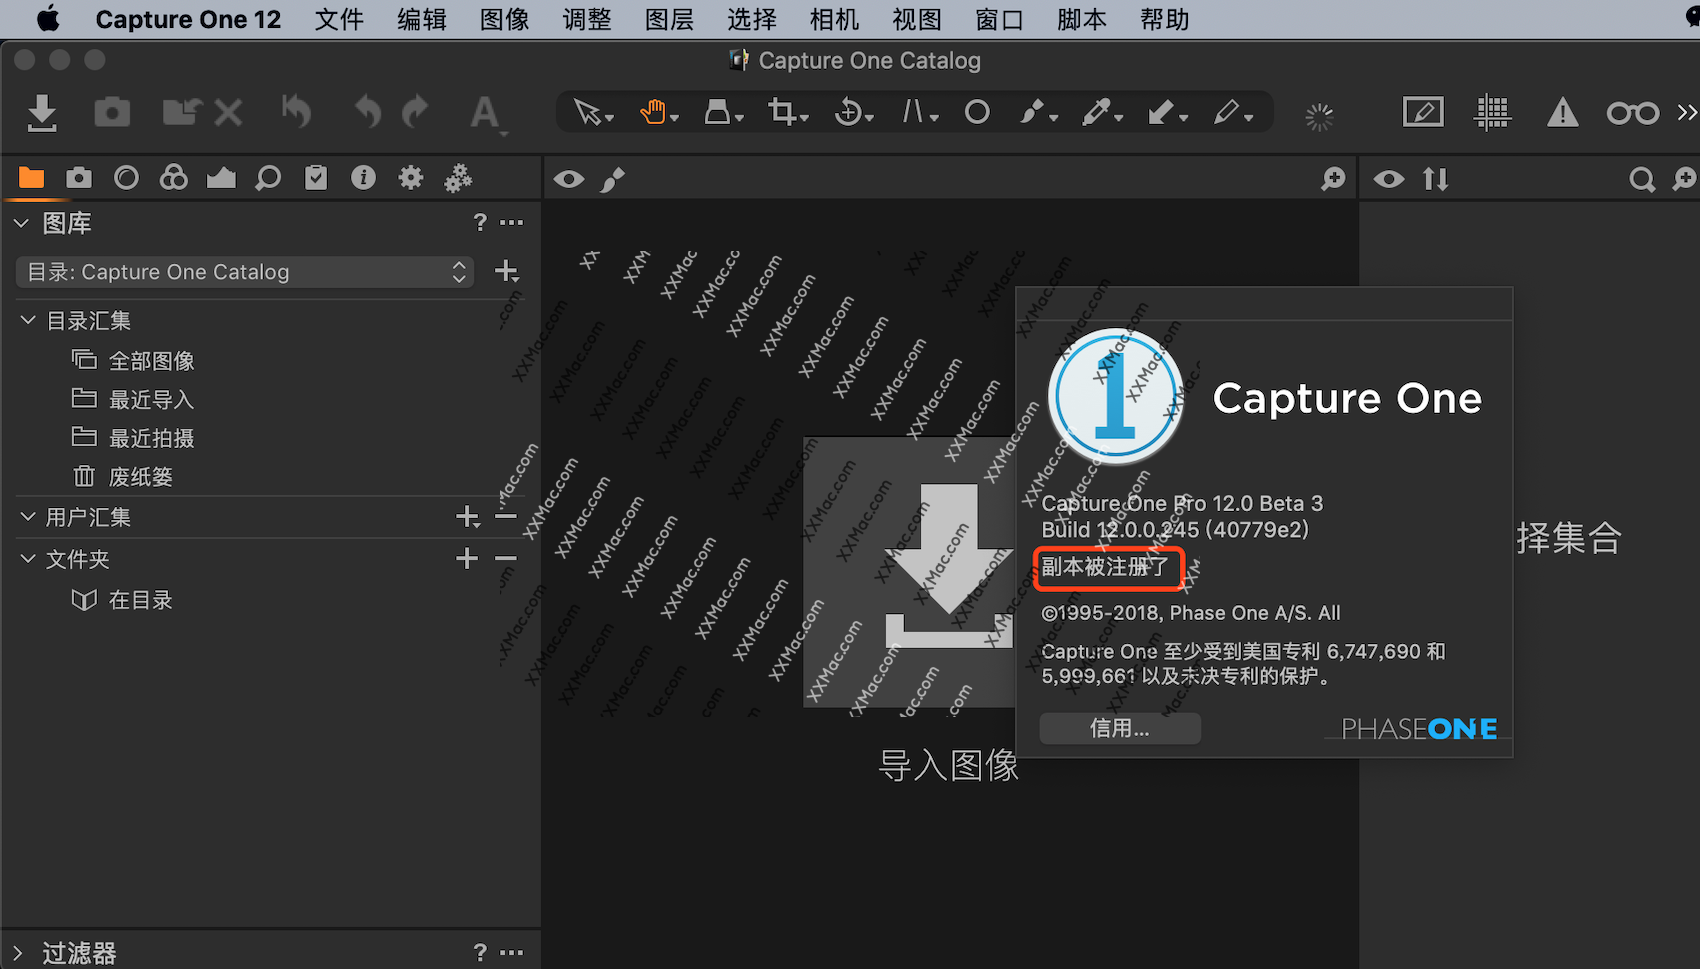 Capture One Pro mac破解版_激活注册码下载_Capture One Pro v12